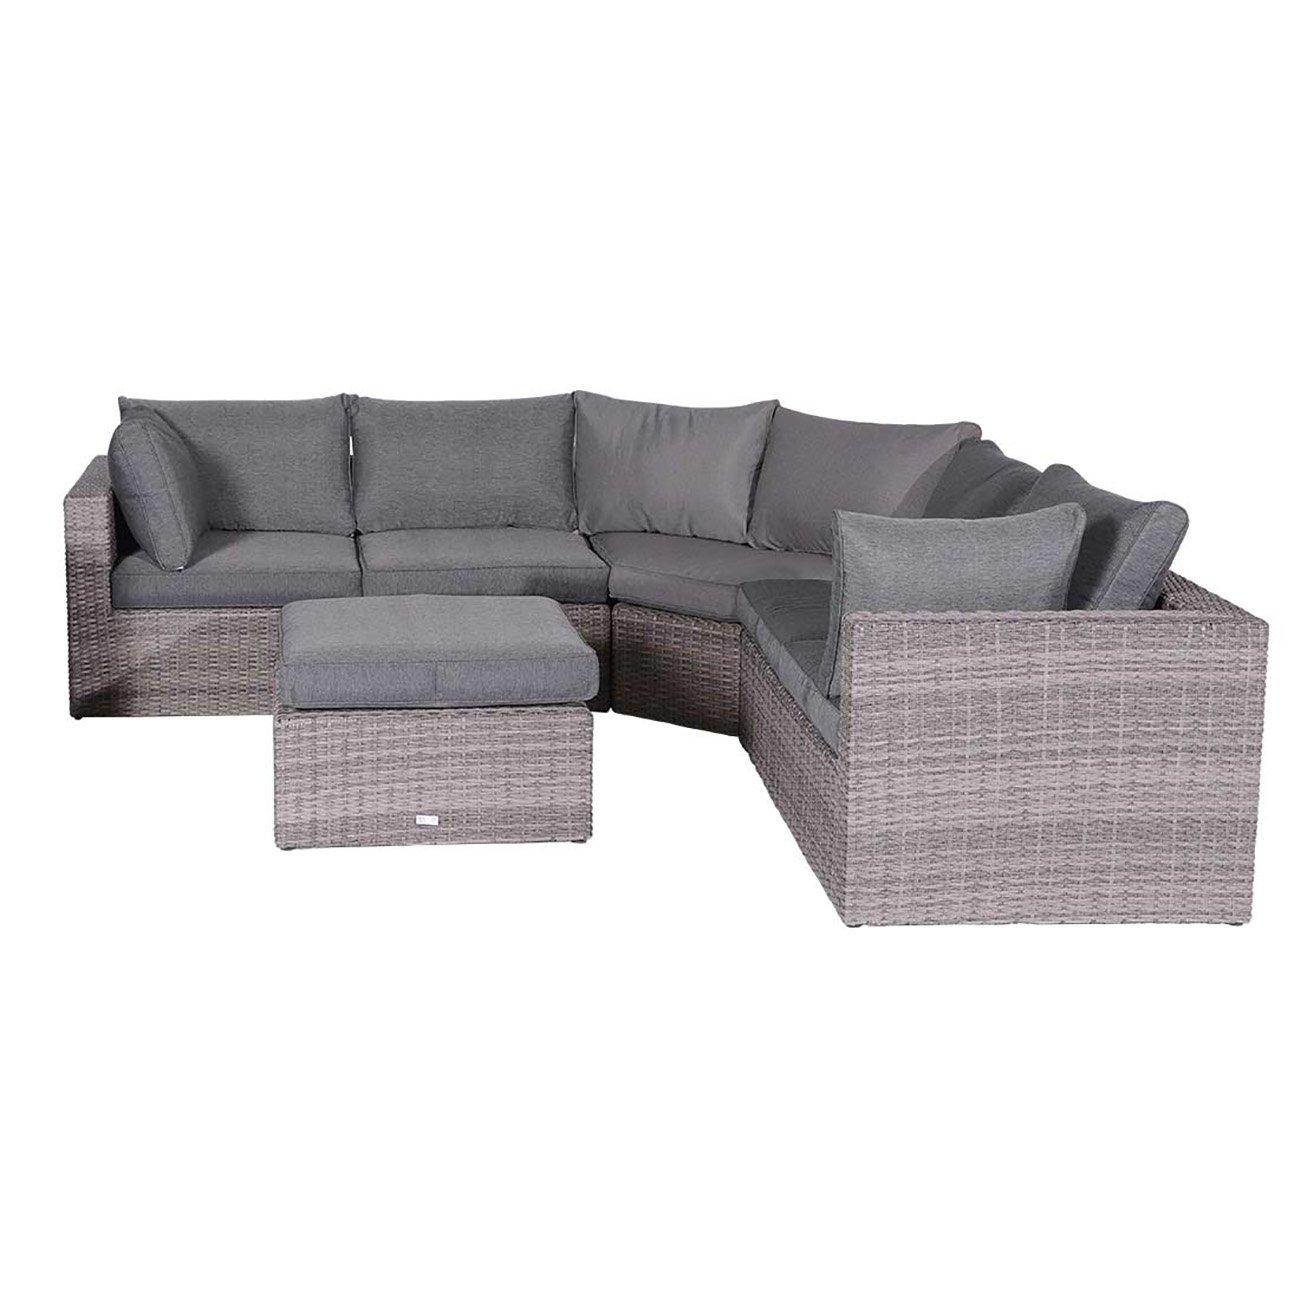 OUTLIV. Madeira XL Lounge 4-tlg Organic Grey / Anthrazit Loungemöbel